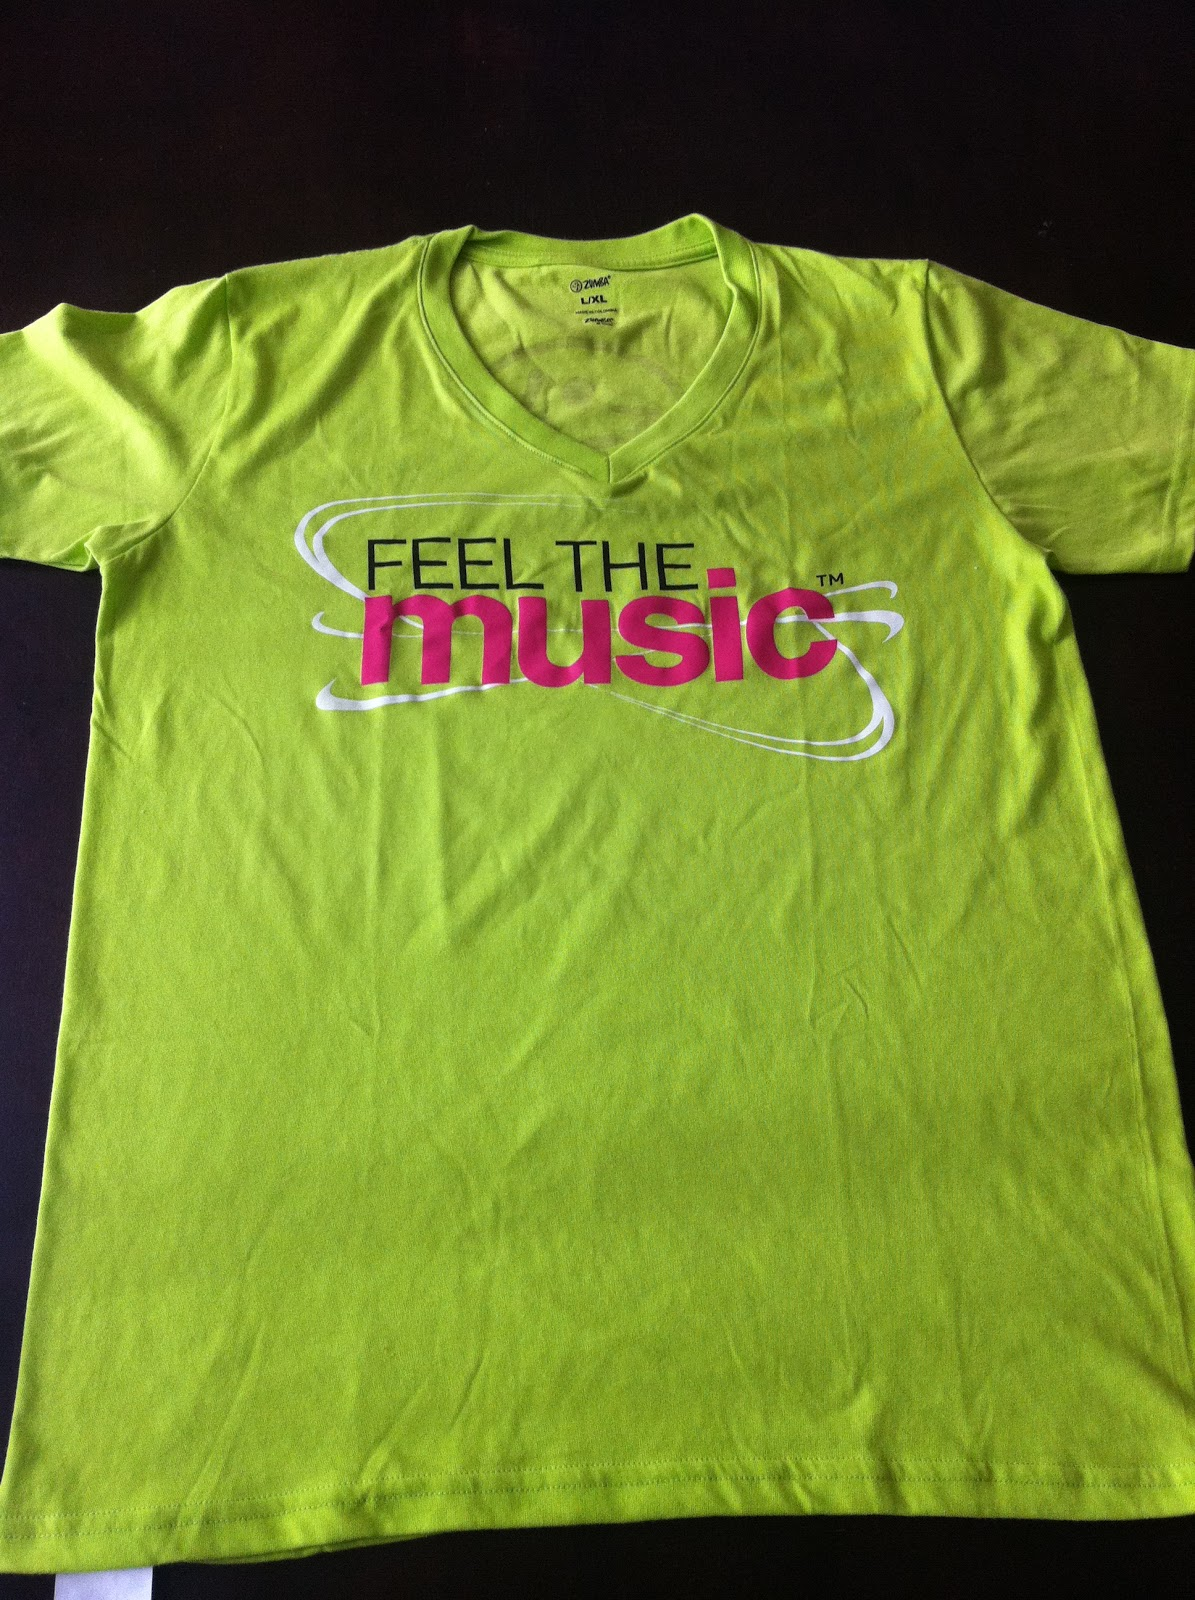 T-shirt design for zumba - Design T Shirts Zumba